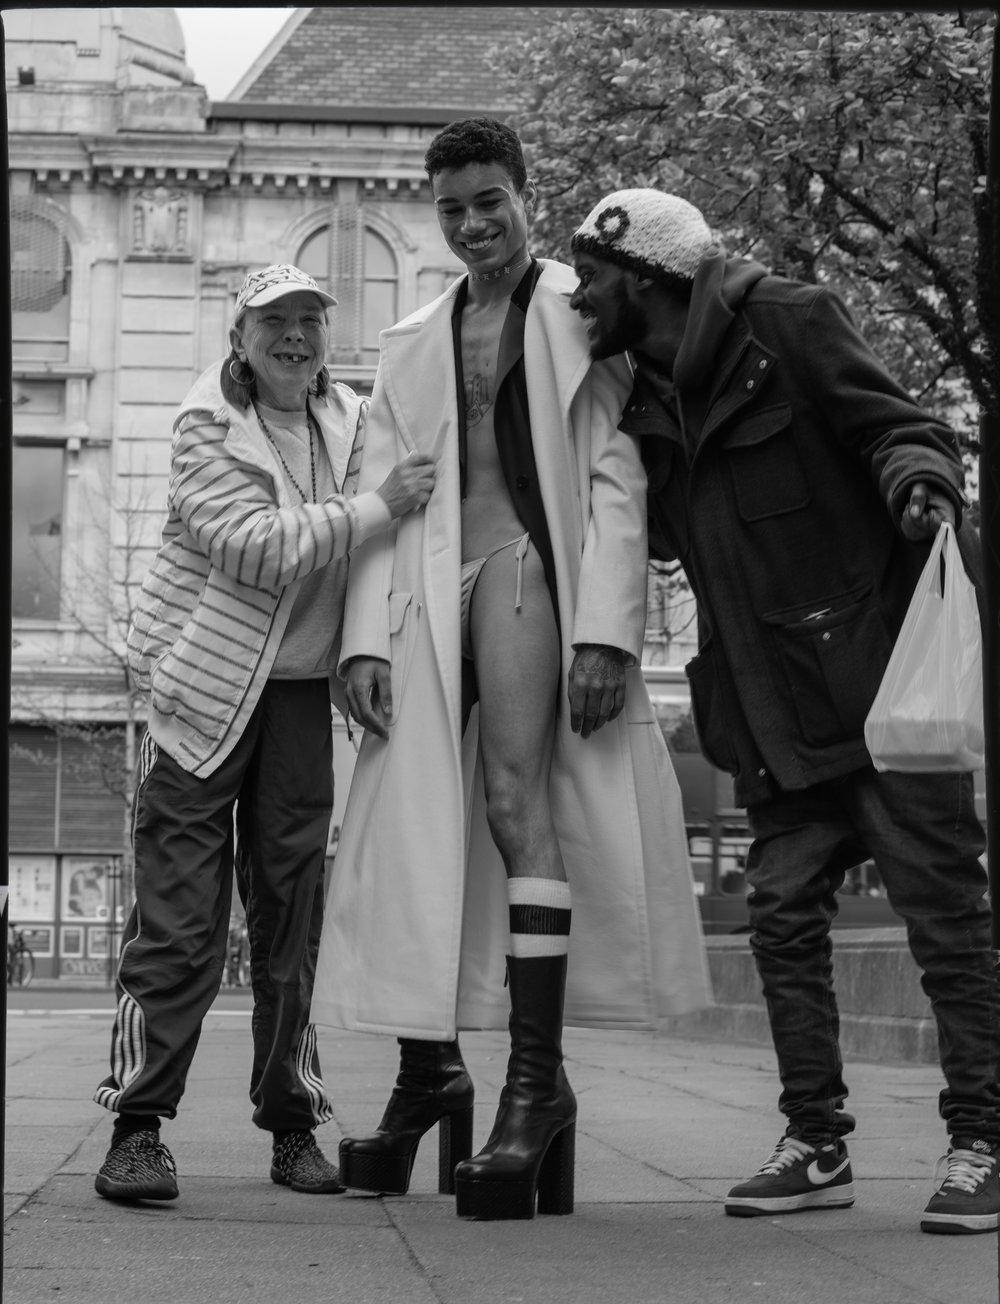 overcoat   CHANEL   |   blazer   MM6 |   boots   DSQUARED |   briefs   MENAGERIE |   socks   BARCODE BERLIN|   chain  DIXIEGRAZE